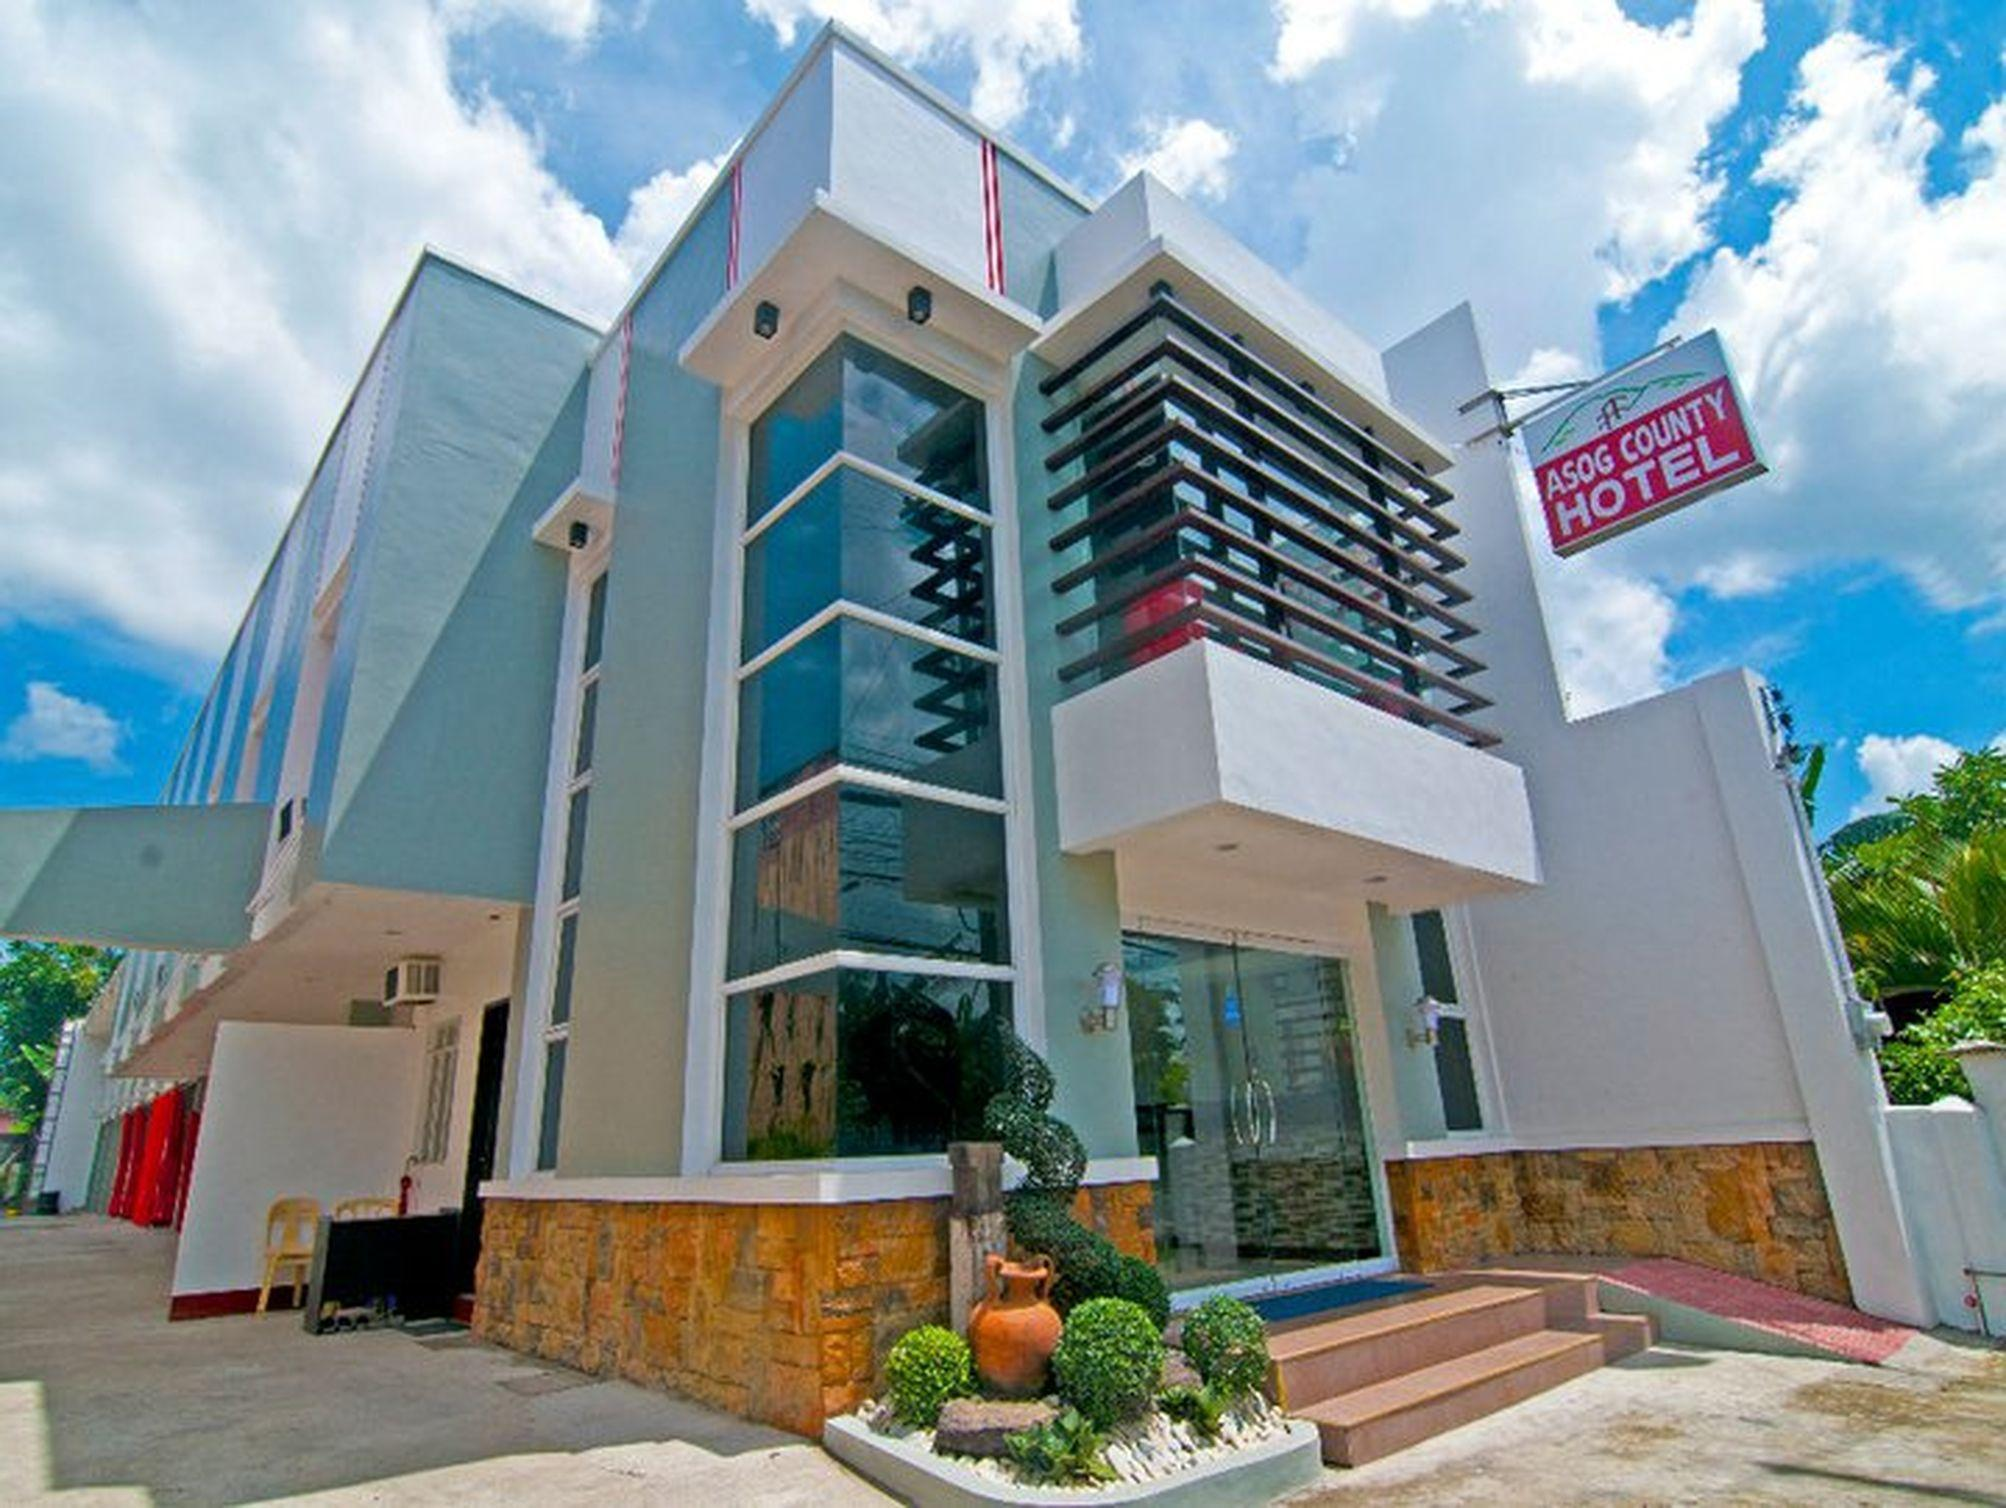 Asog County Hotel Bicol